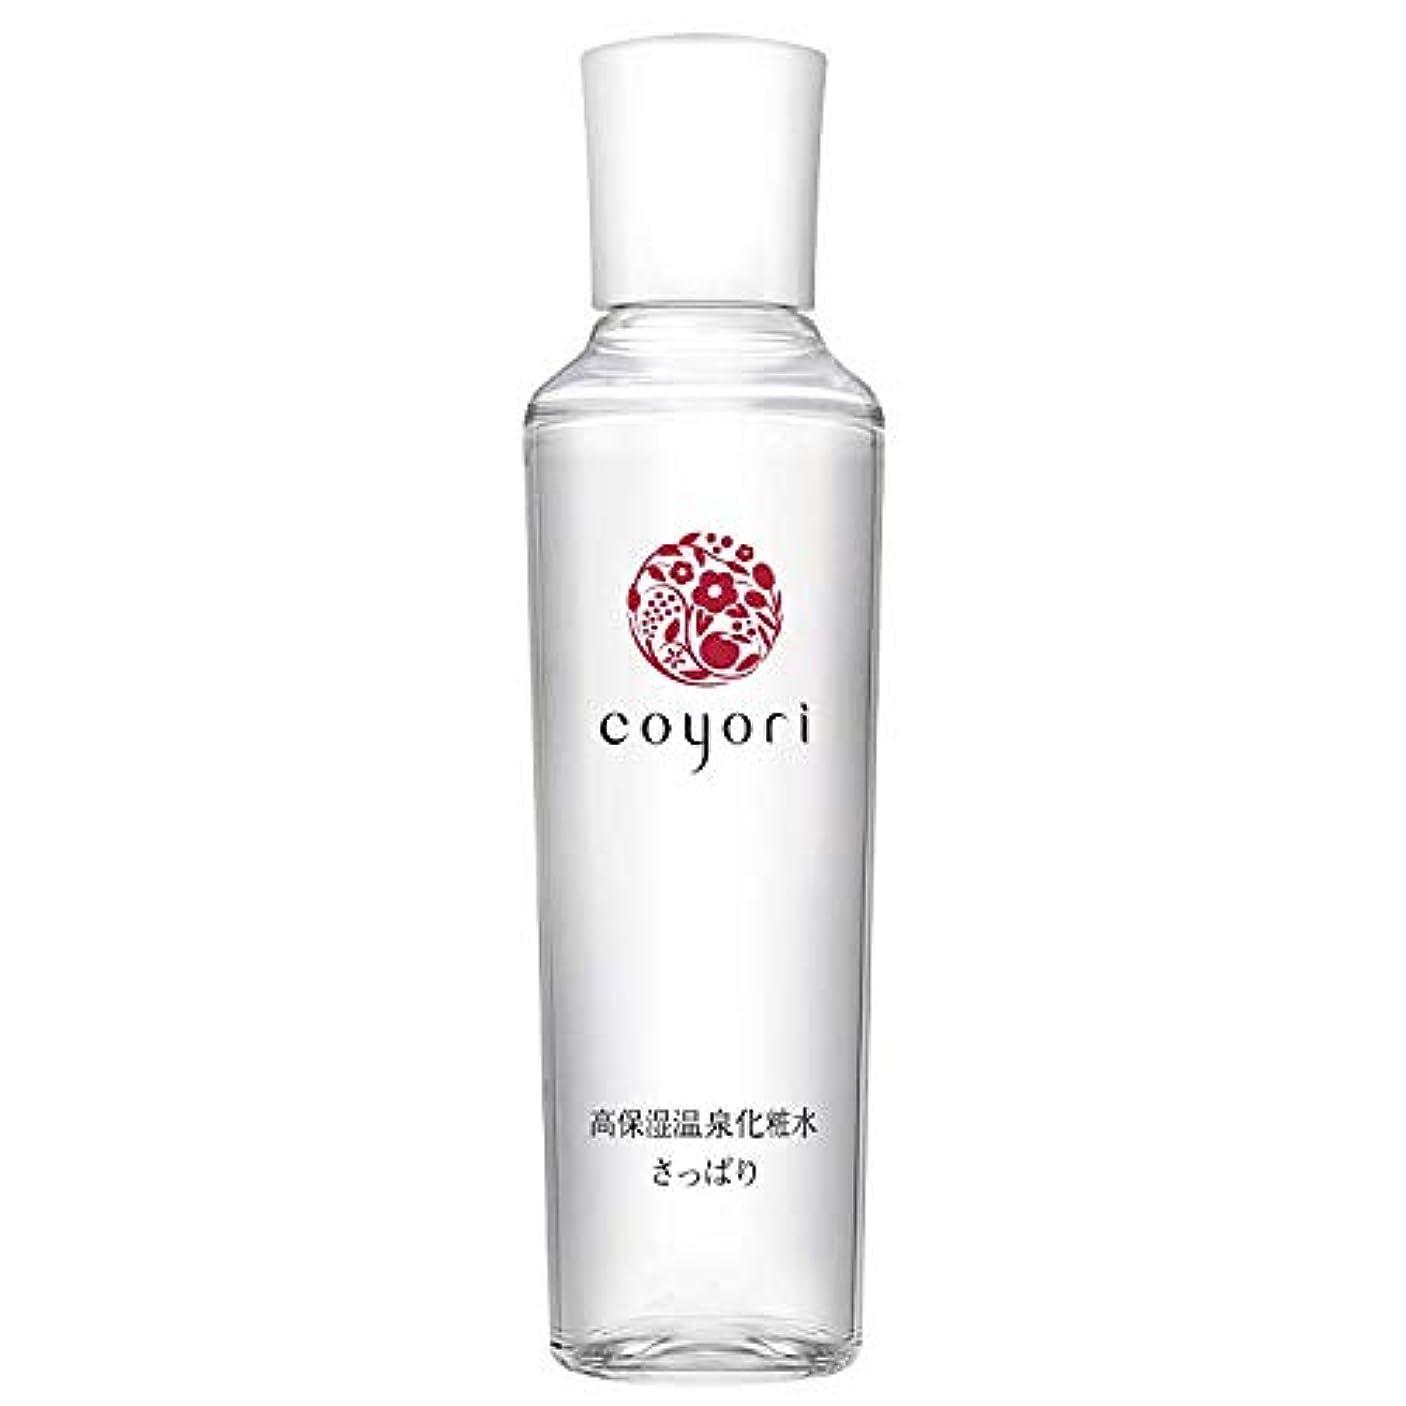 Coyori コヨリ 高保湿温泉化粧水 さっぱりタイプ 100mL [ 11種無添加 玉造温泉水50%以上配合 湯上がり肌 もっちり潤う 高機能 自然派エイジングケア こより 乾燥ケア 保湿力 スキンケア ]